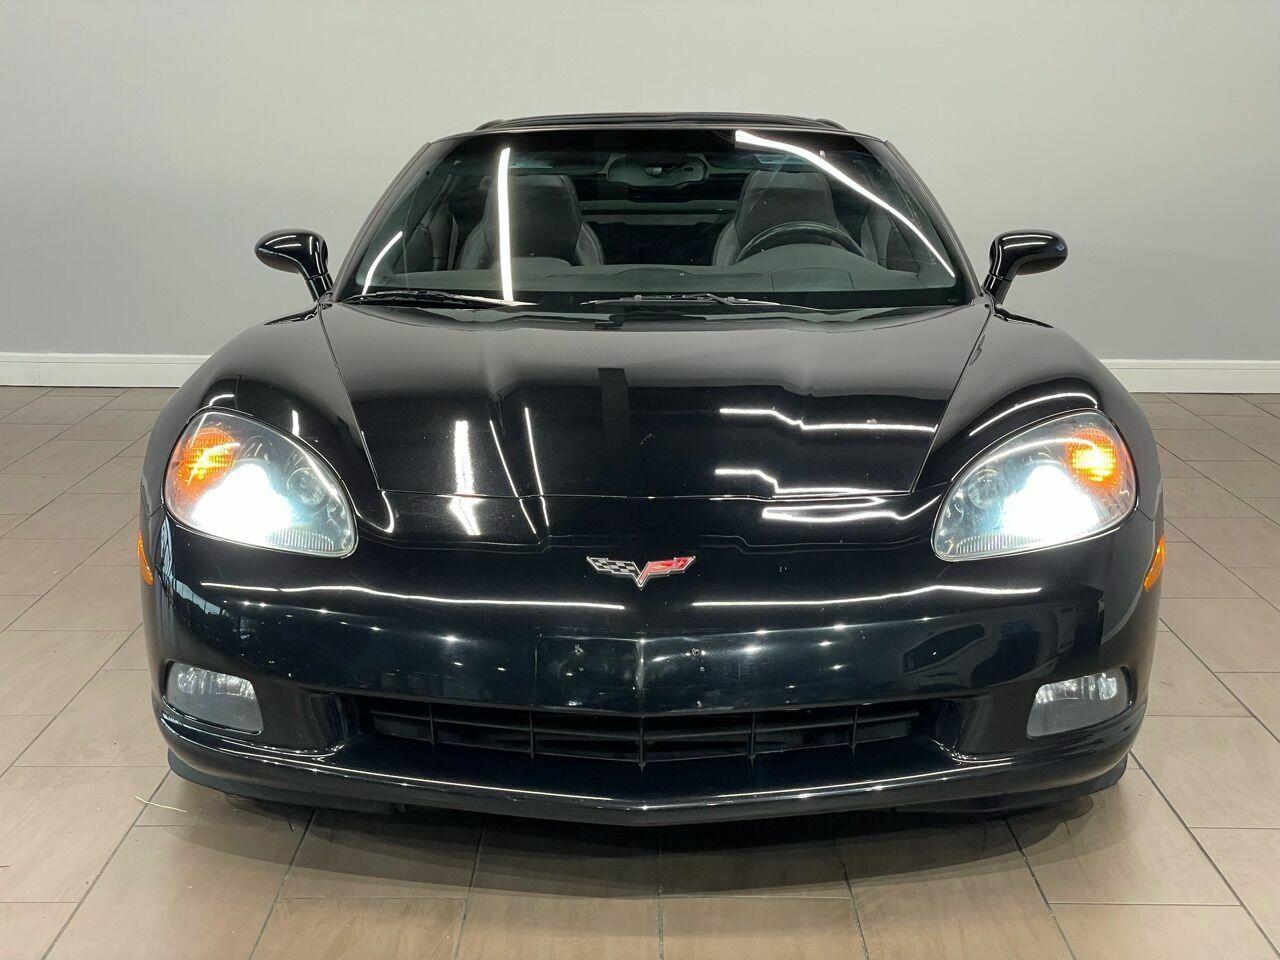 2010 Black Chevrolet Corvette     C6 Corvette Photo 5